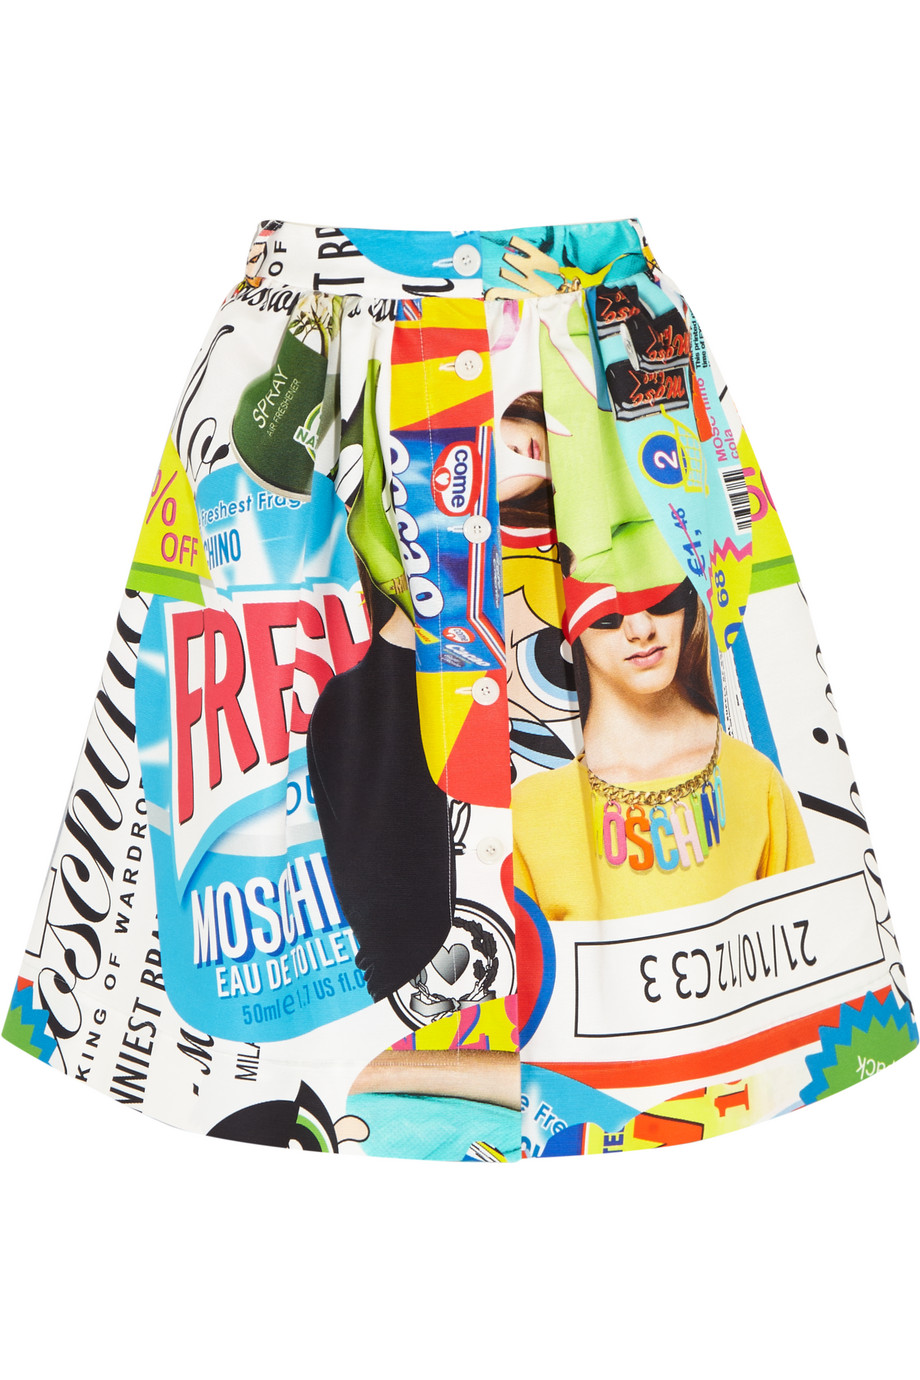 Moschino Printed Cotton-Blend Faille Skirt, Blue, Women's, Size: 44